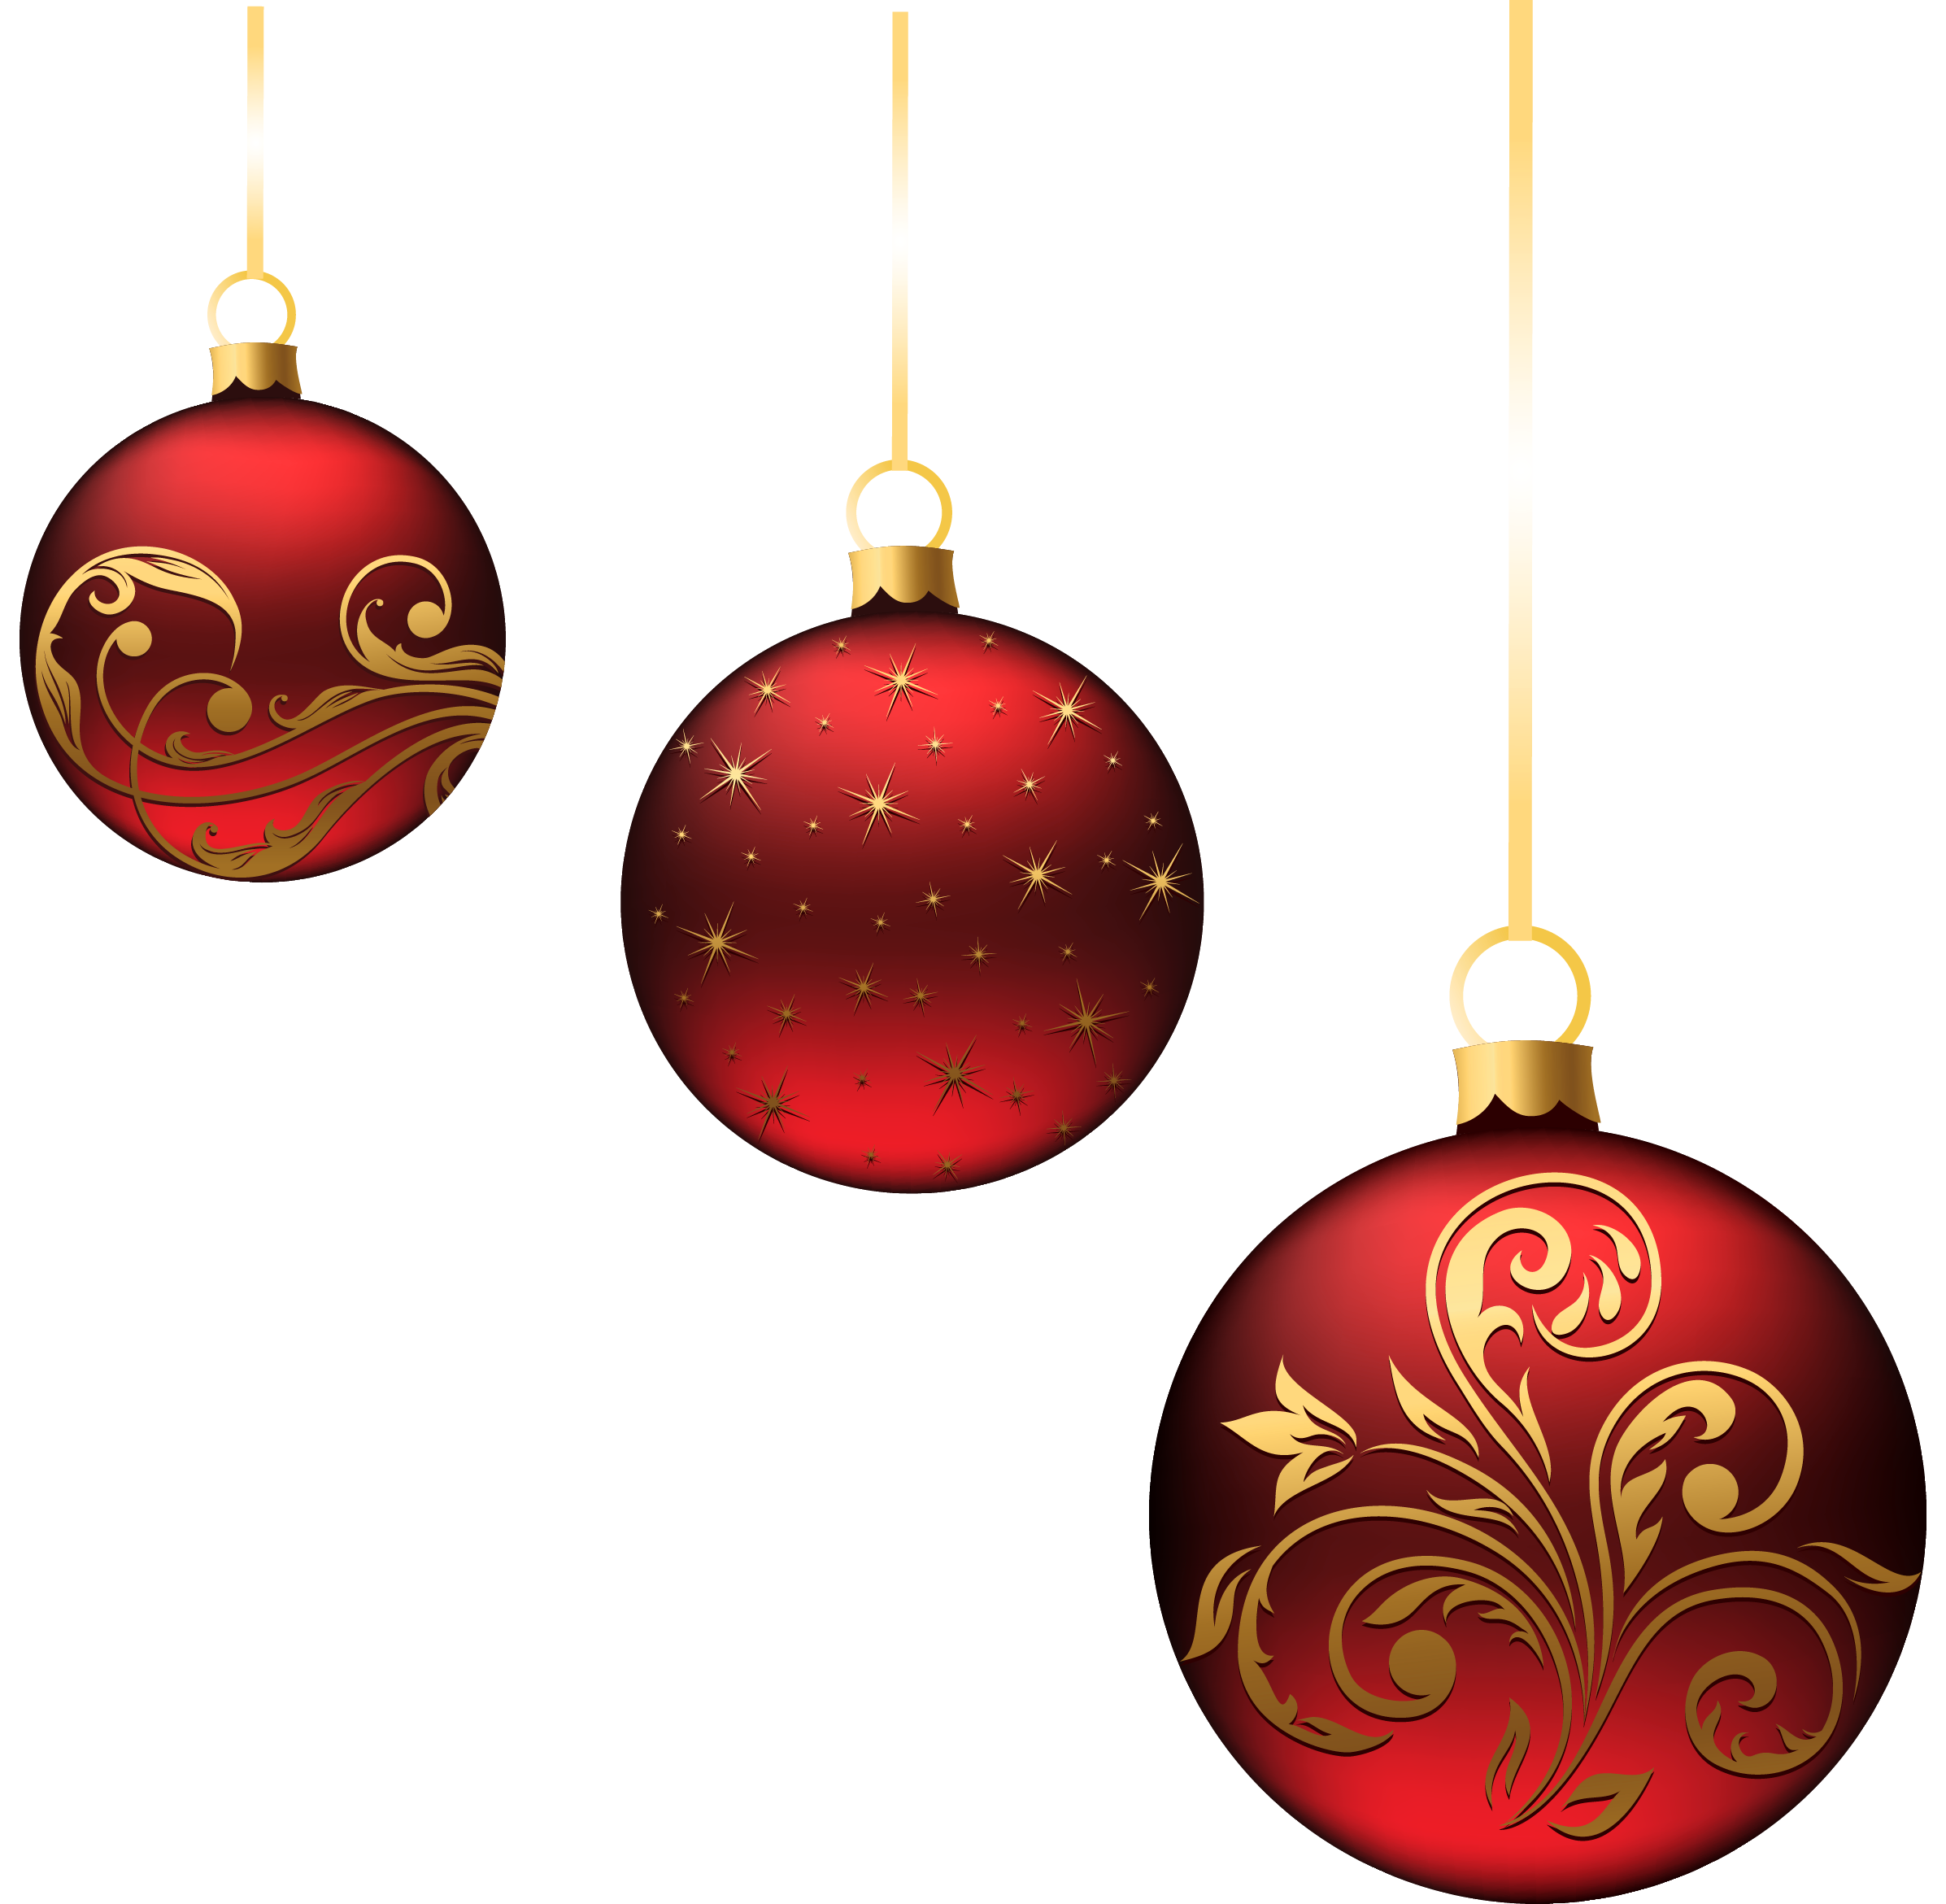 Christmas ball toy PNG image